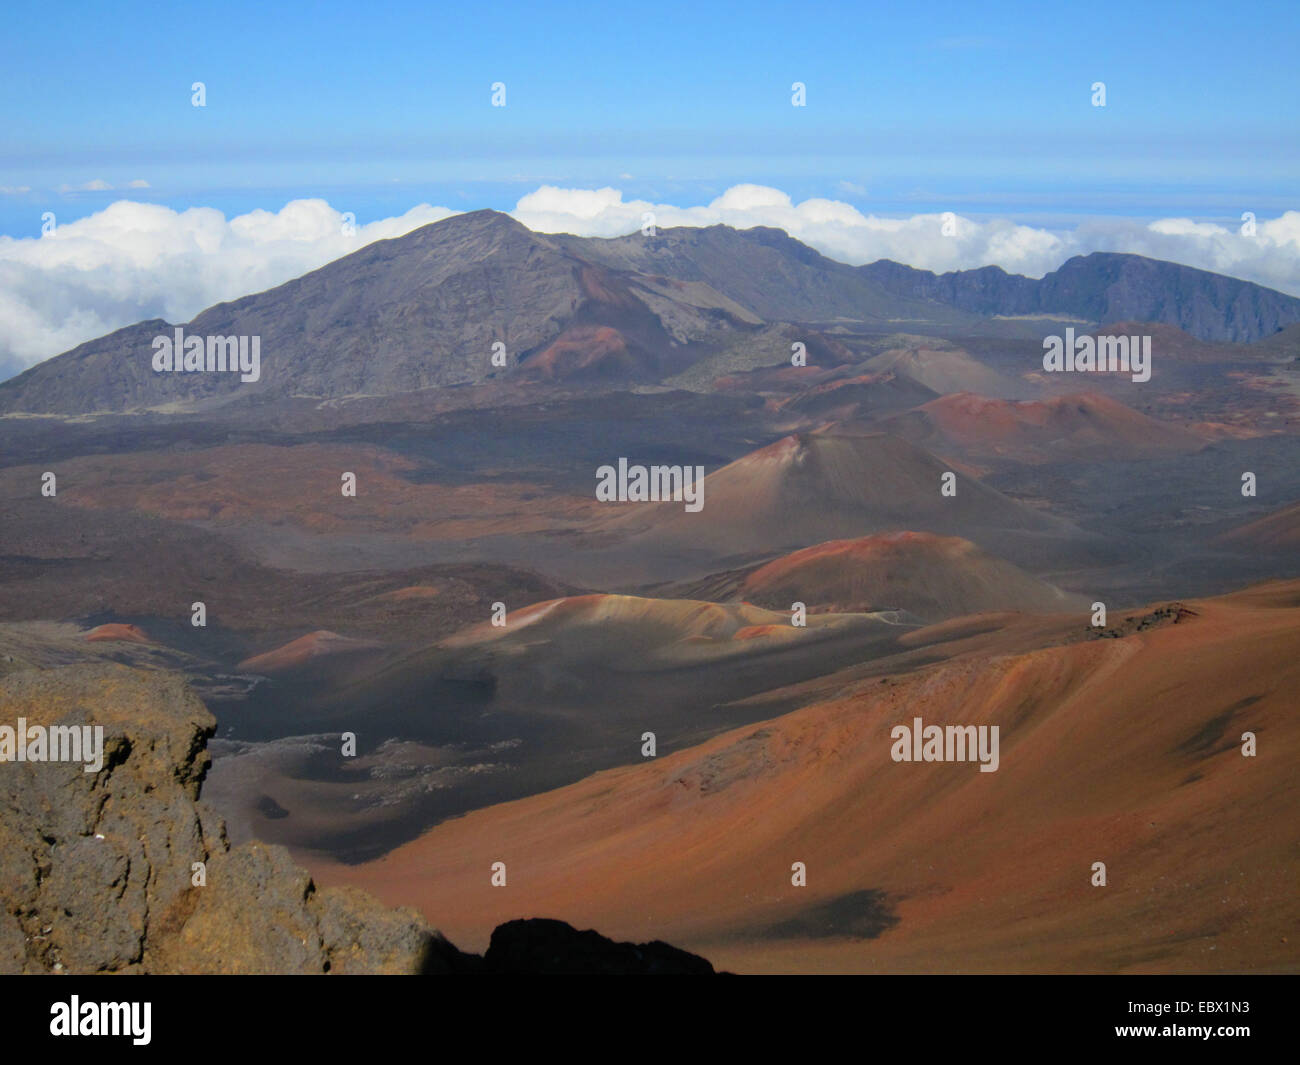 crater of Haleakala volcano, USA, Hawaii, Maui - Stock Image